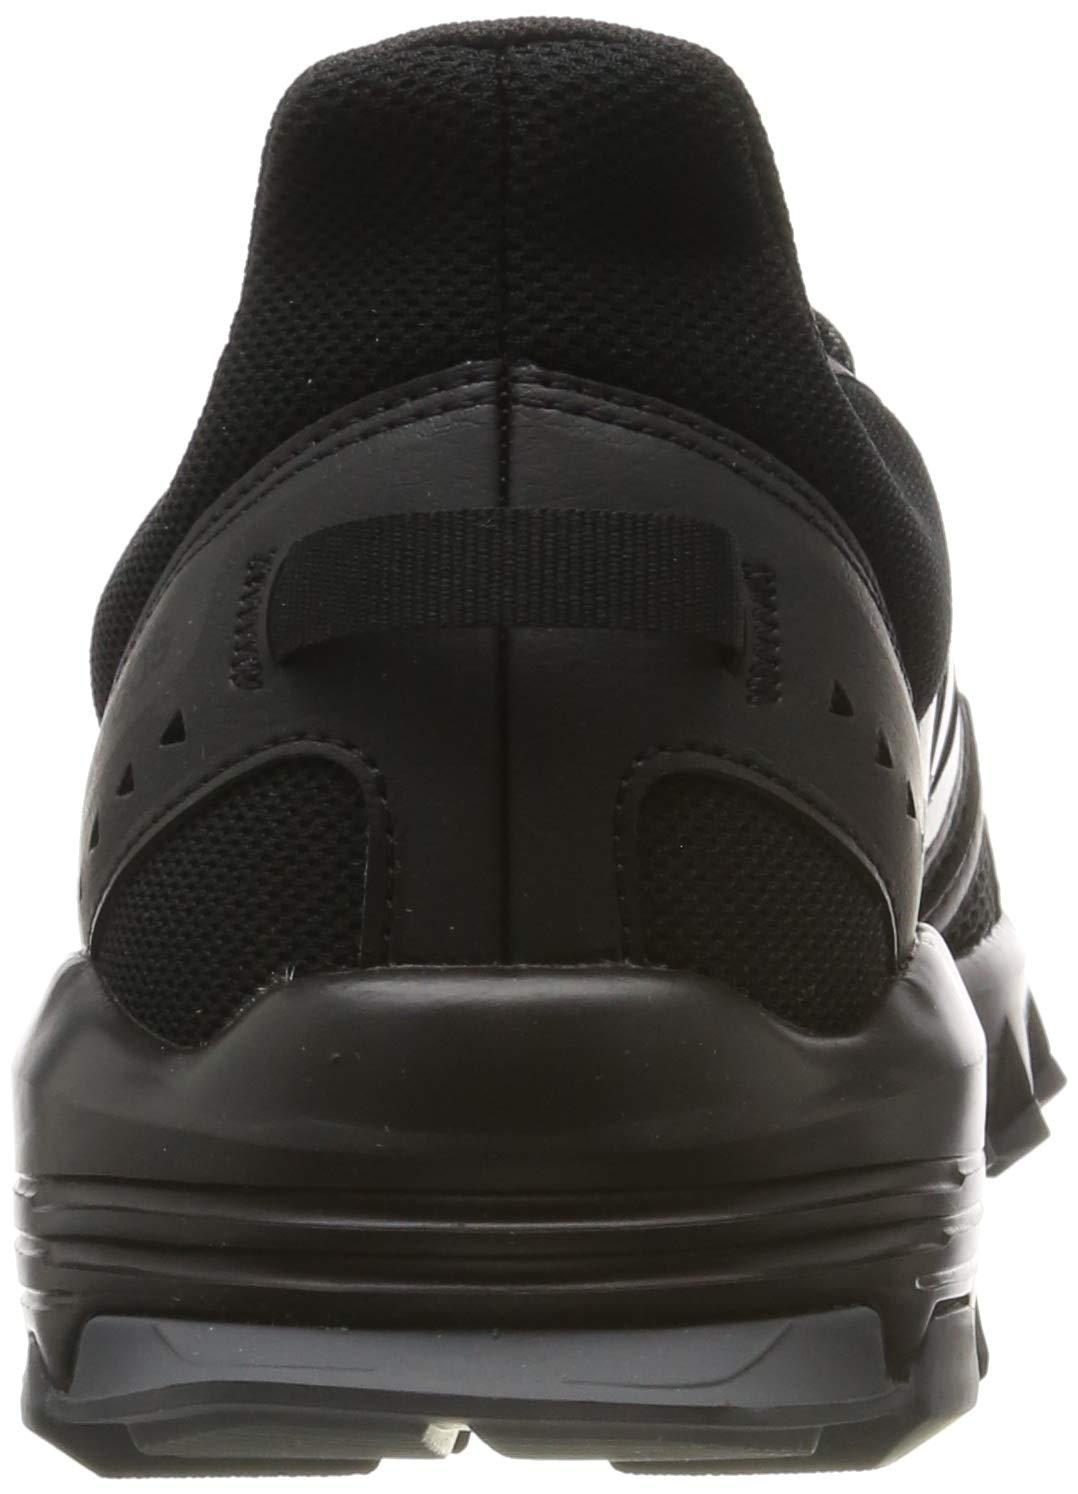 adidas Rockadia Trail Running Shoes - SS19